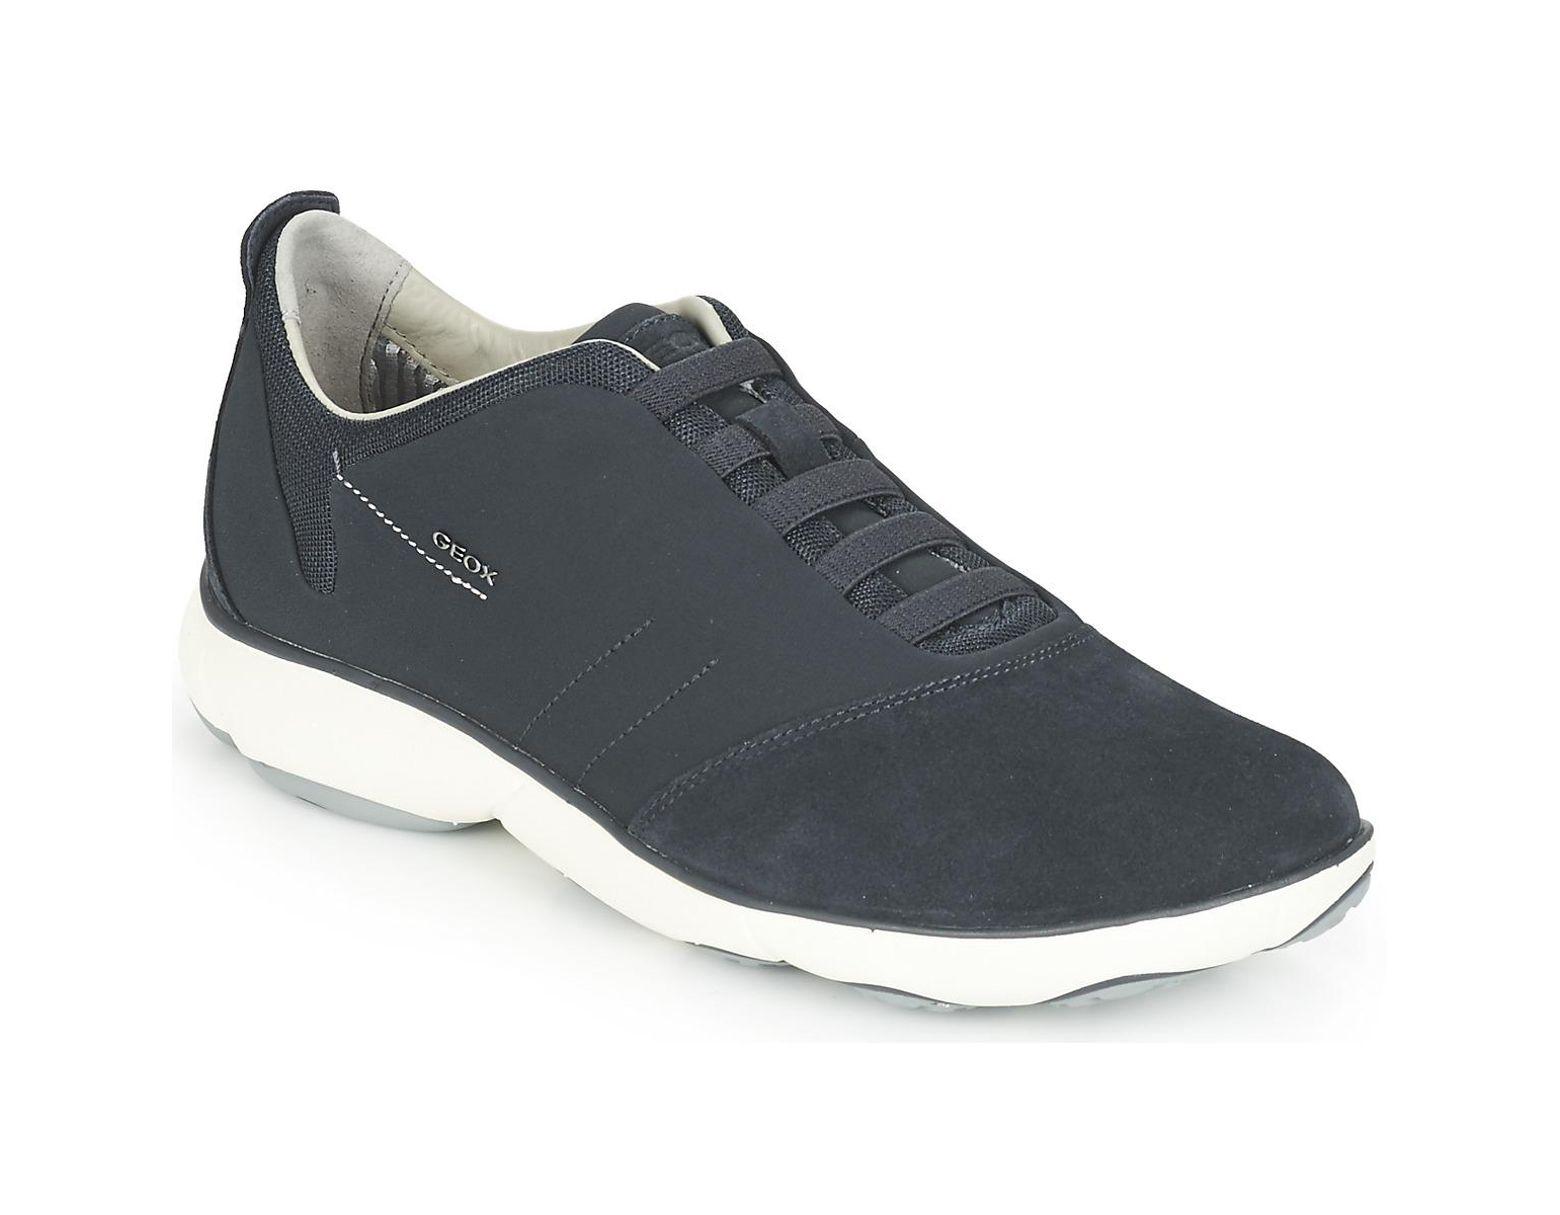 6ify7gybv Nebula Men's Shoestrainersin Lyst For Blue Men Geox dxoEQWBerC